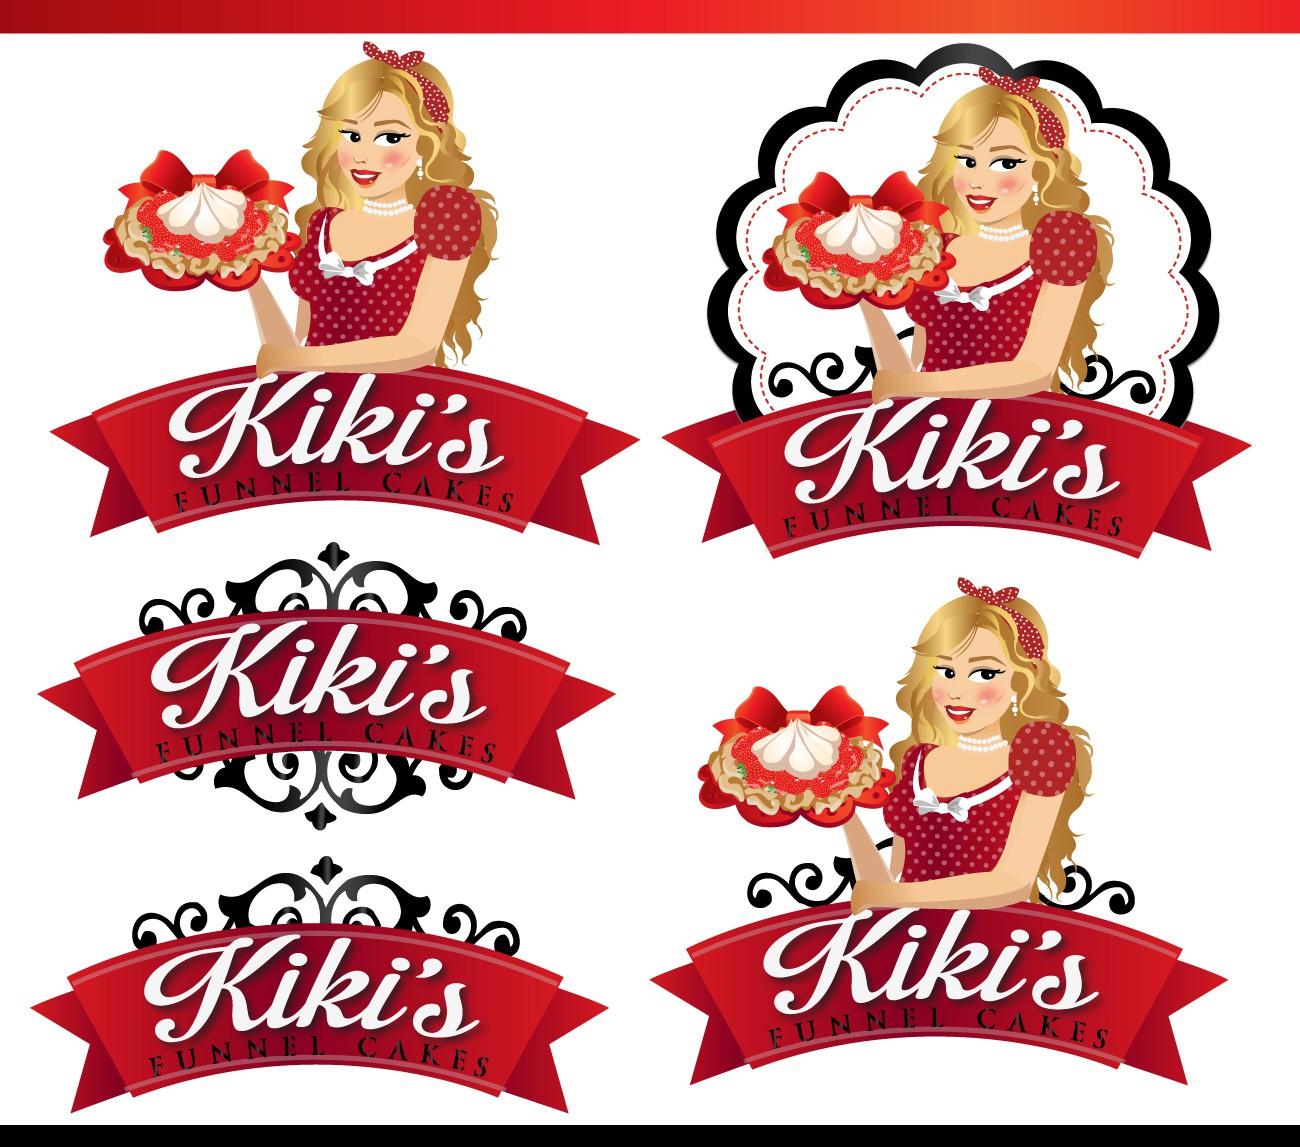 Create the next logo for Kiki's Funnel Cakes